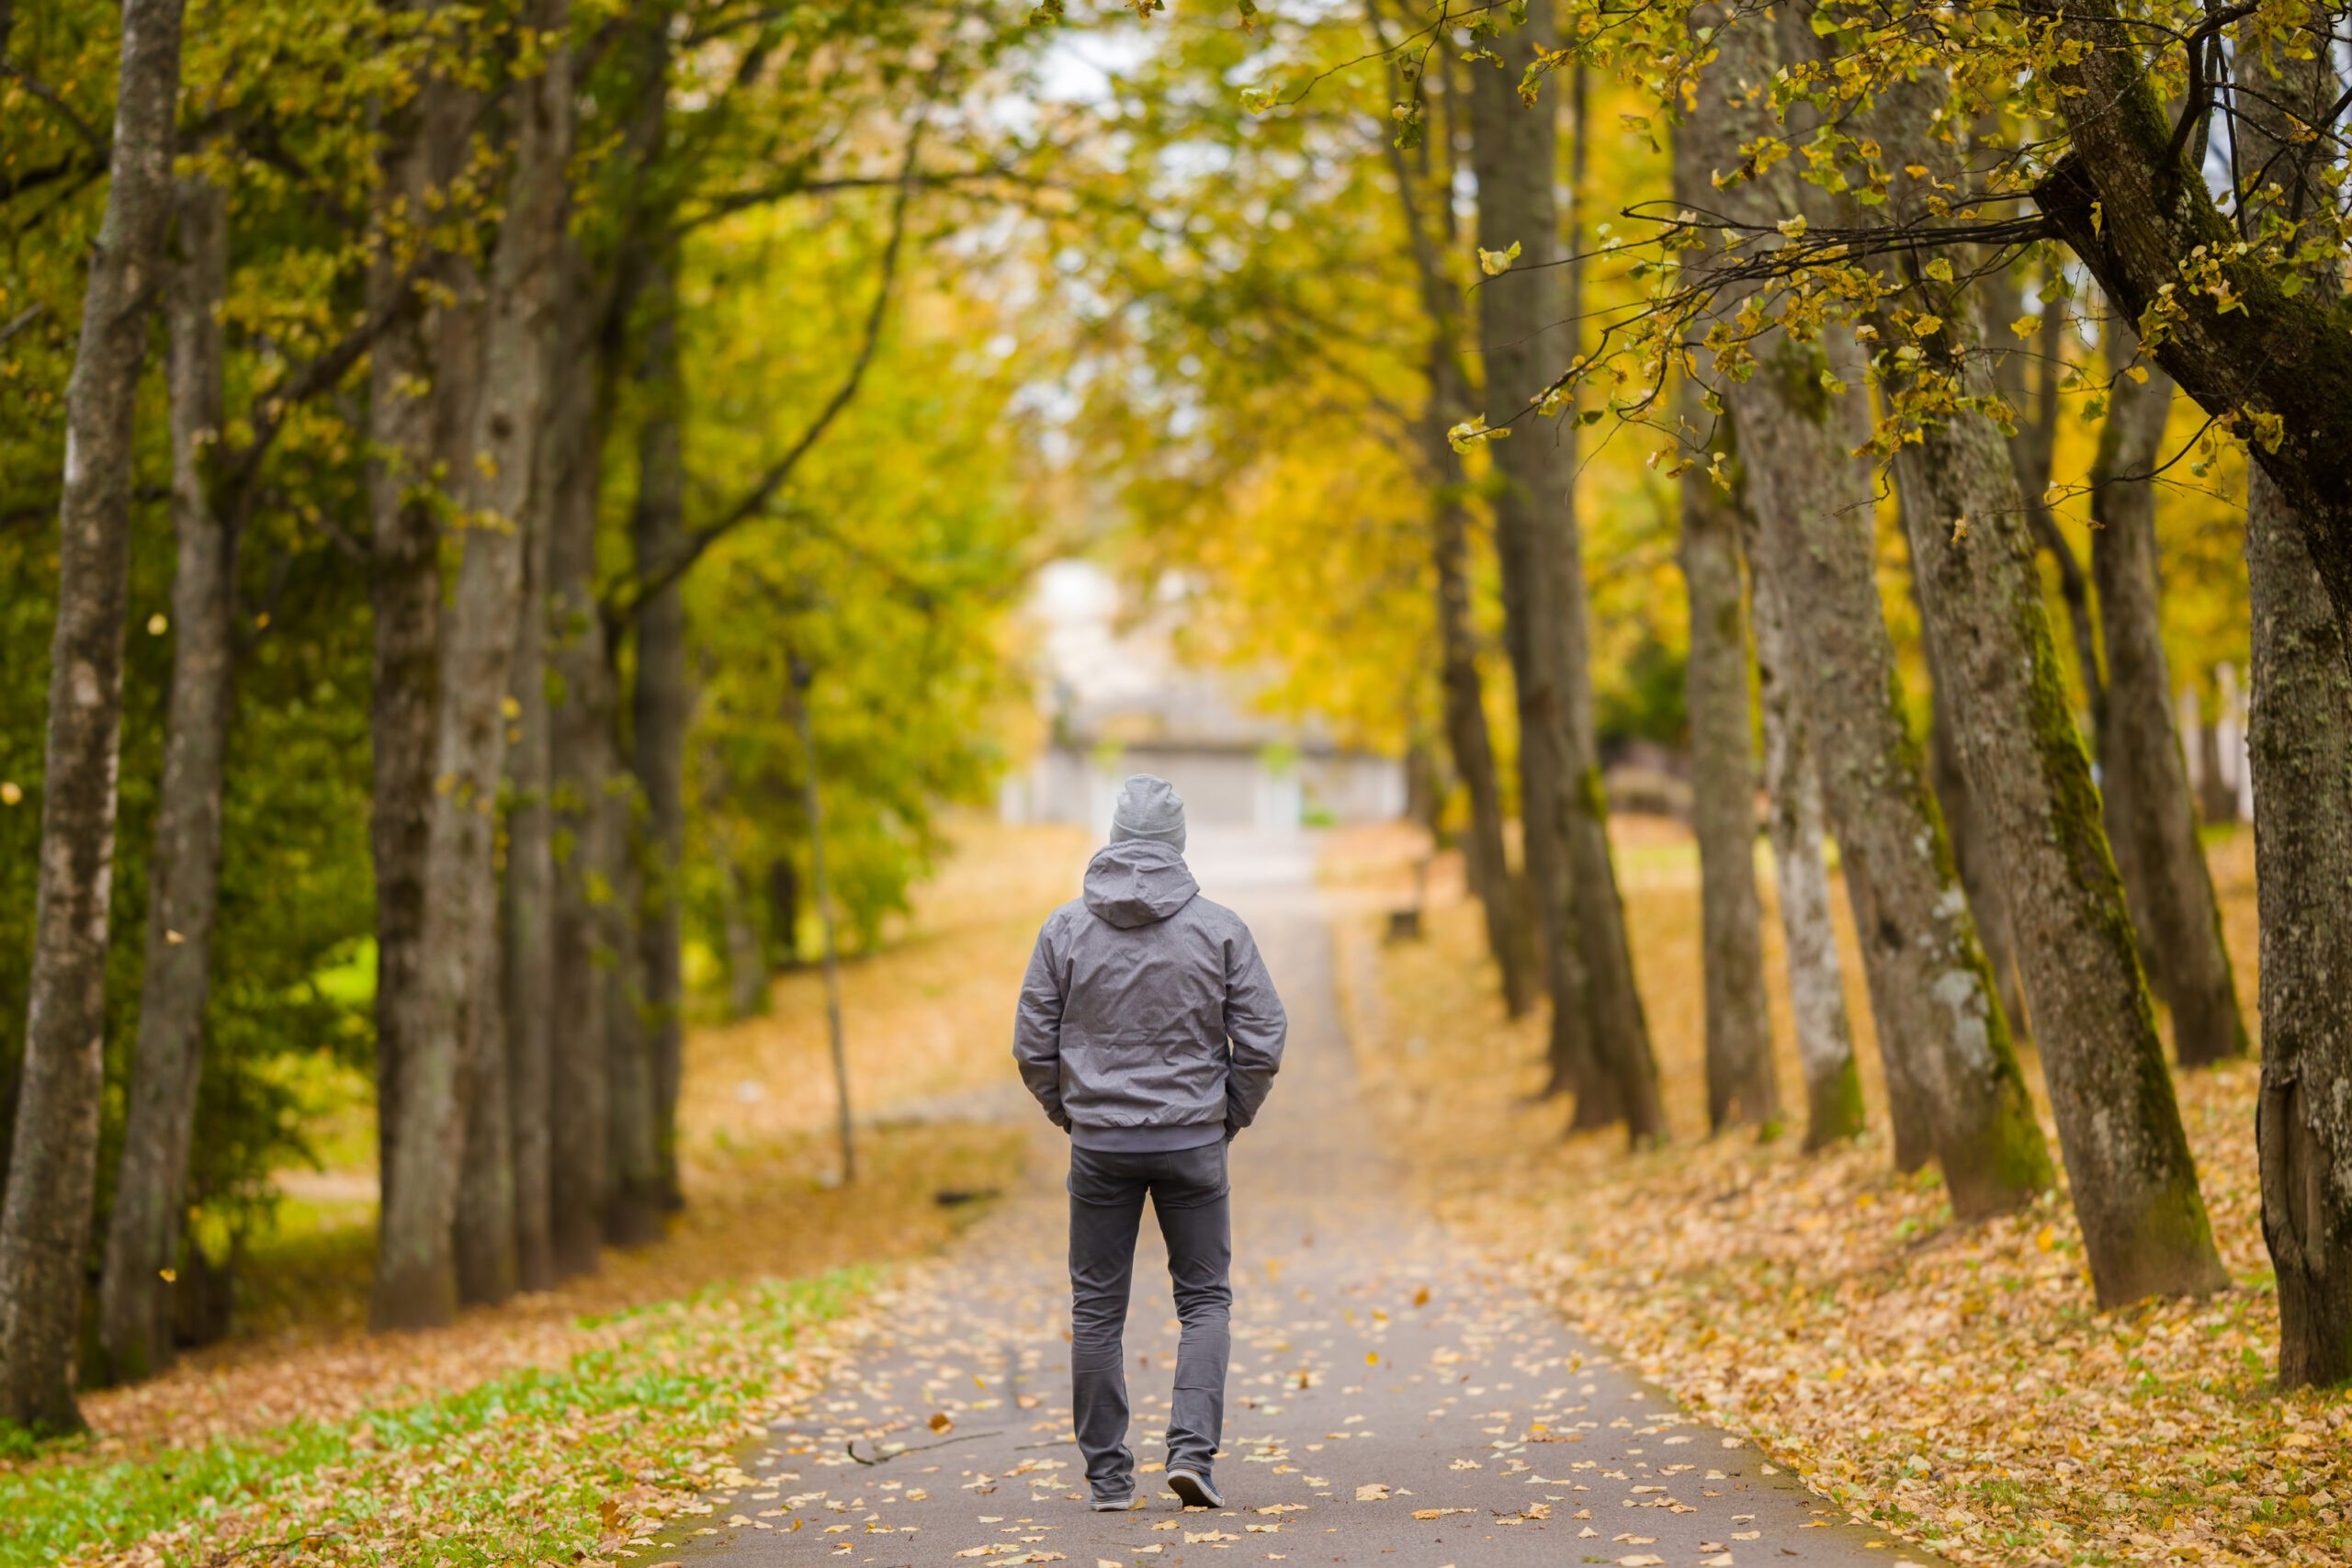 Man a wearing jacket walking through a park